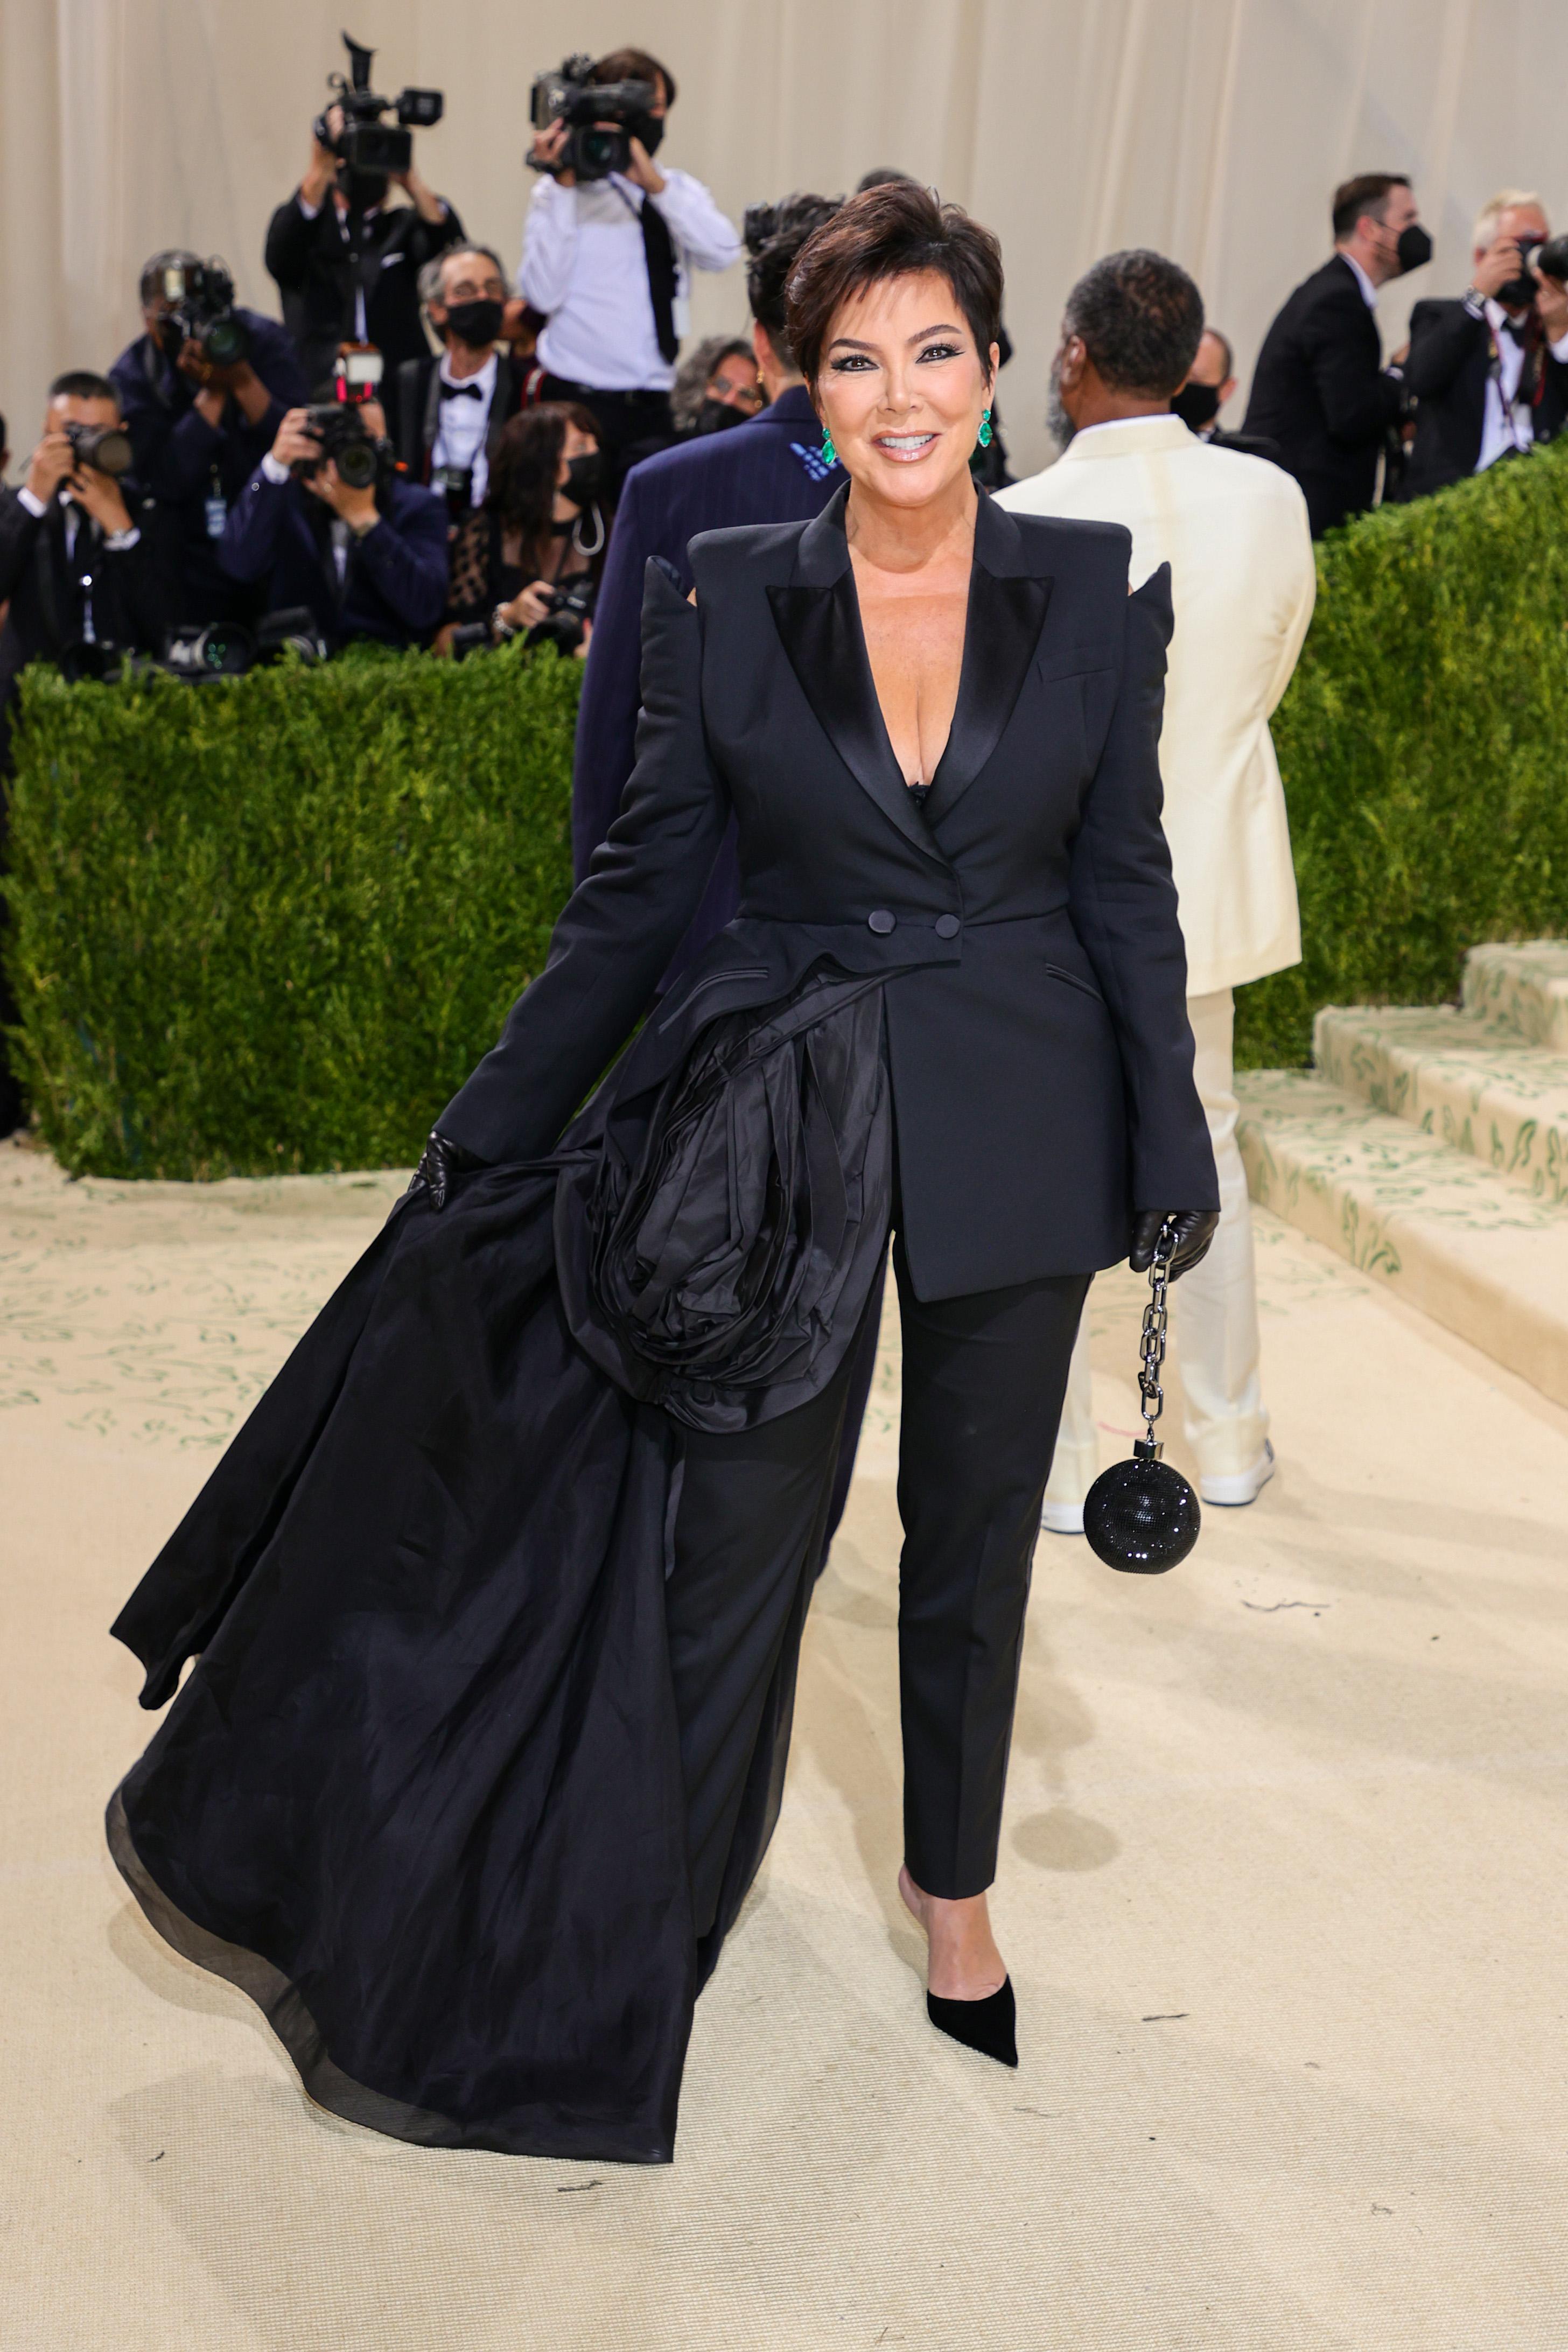 Kris Jenner arrives at the Met Gala